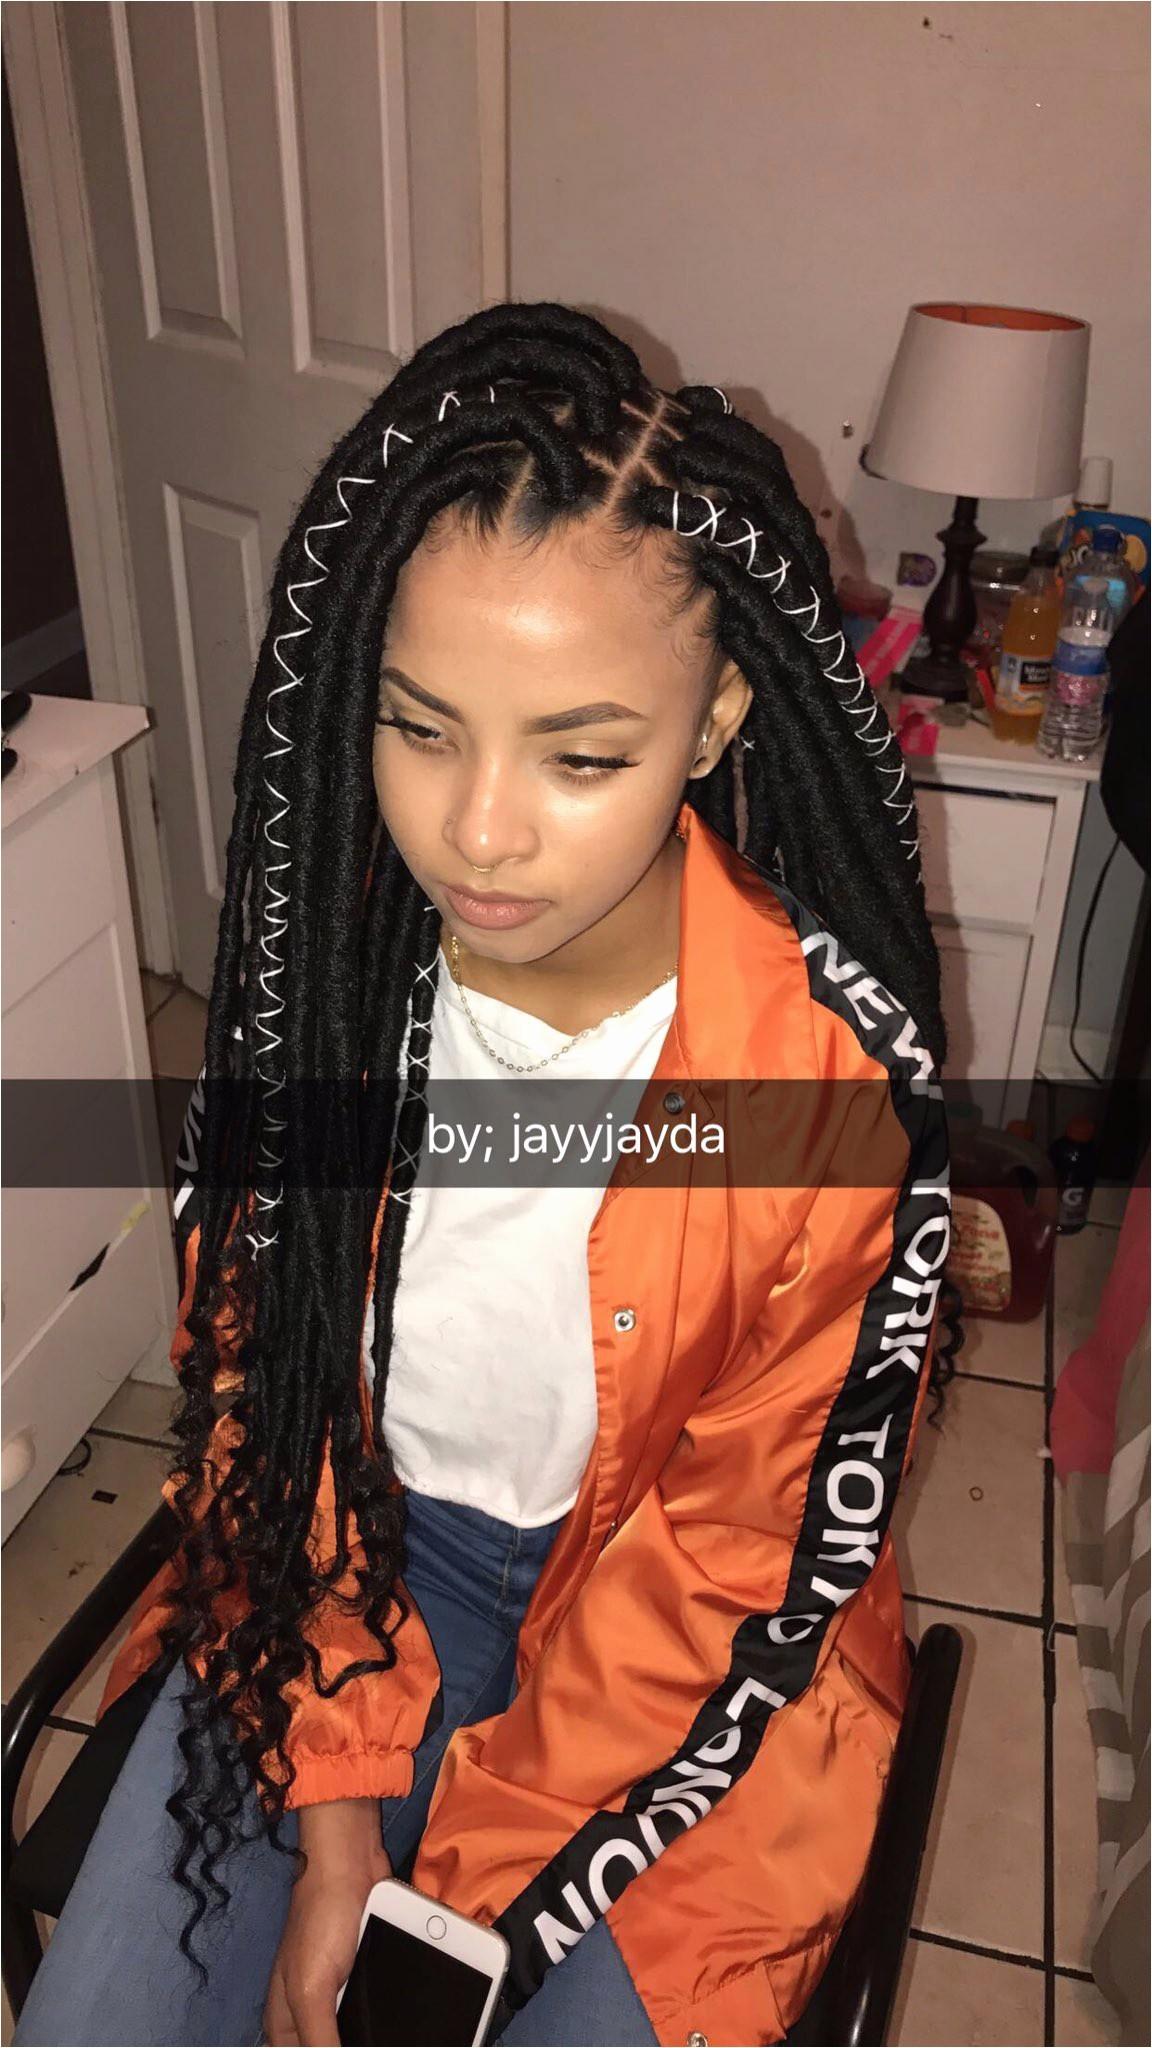 7 Year Old Girl Hairstyles Image New New Black Girl Hairstyles Kitharingtonweb 15 Elegant 7